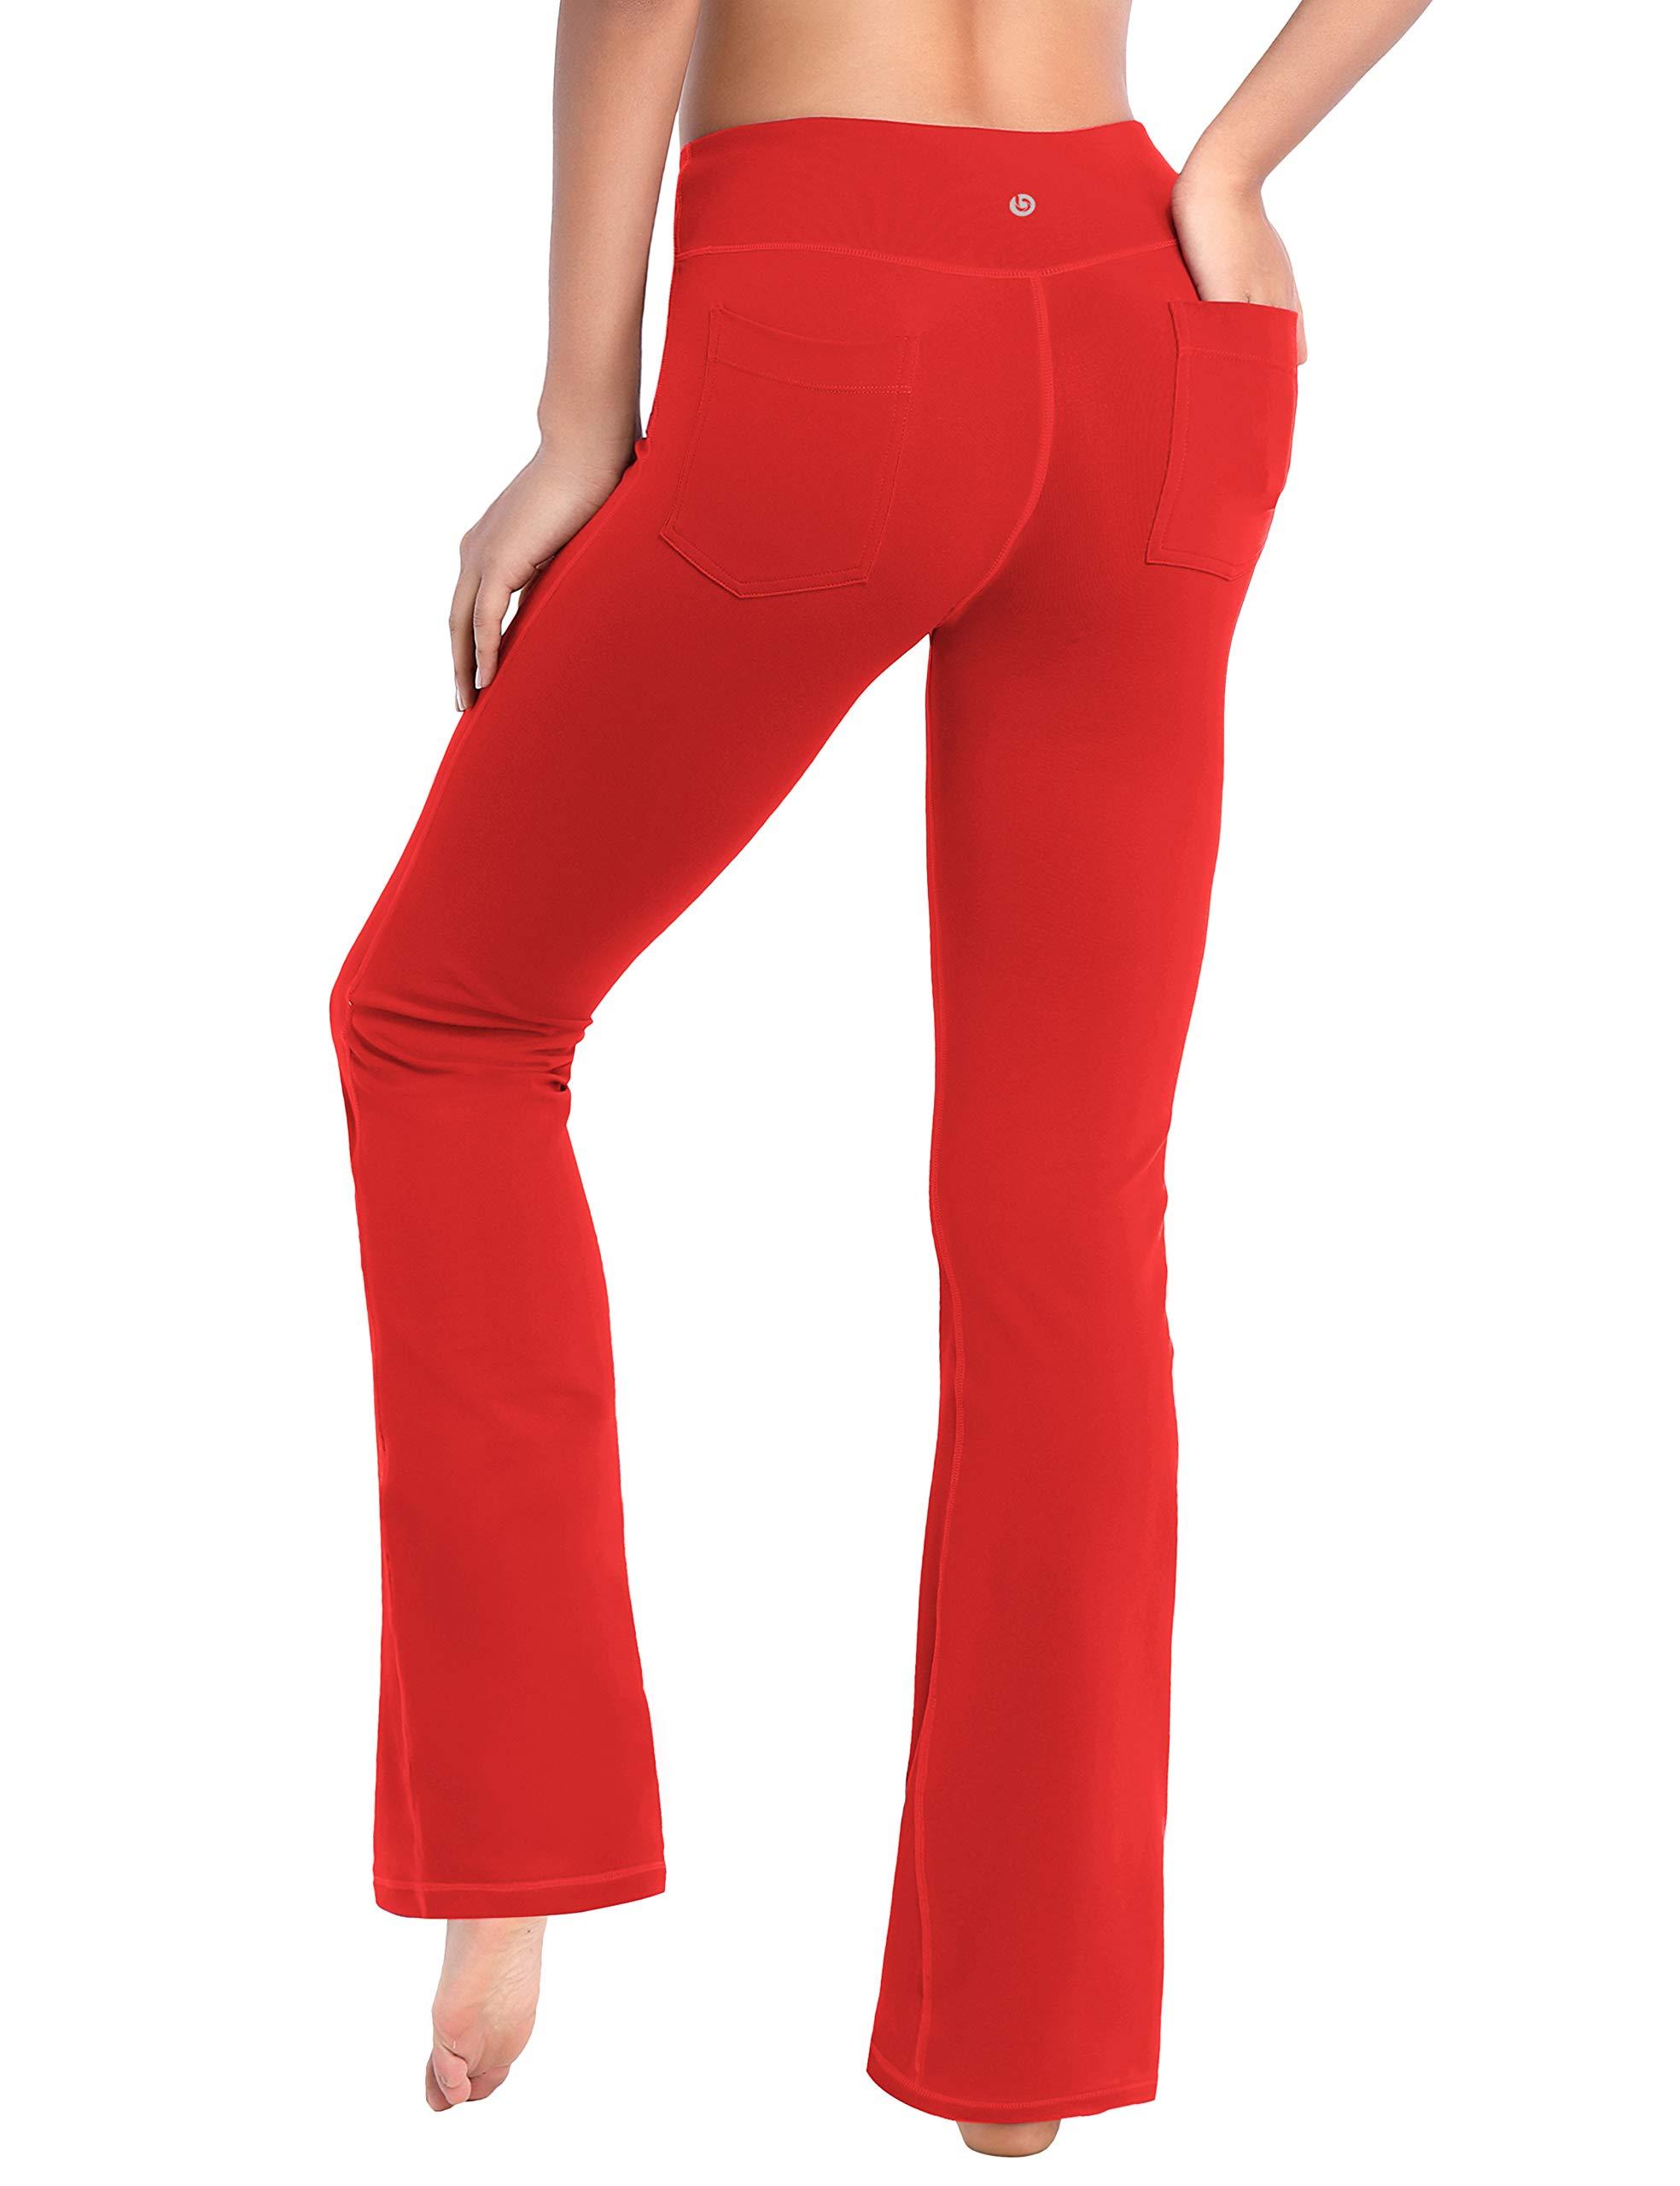 BUBBLELIME 19''/29''/31''/33''/35'' 4 Styles Women High Waist Bootcut Yoga Pants Basic/Back Pocket/Straight Leg Soft Workout Flare by BUBBLELIME